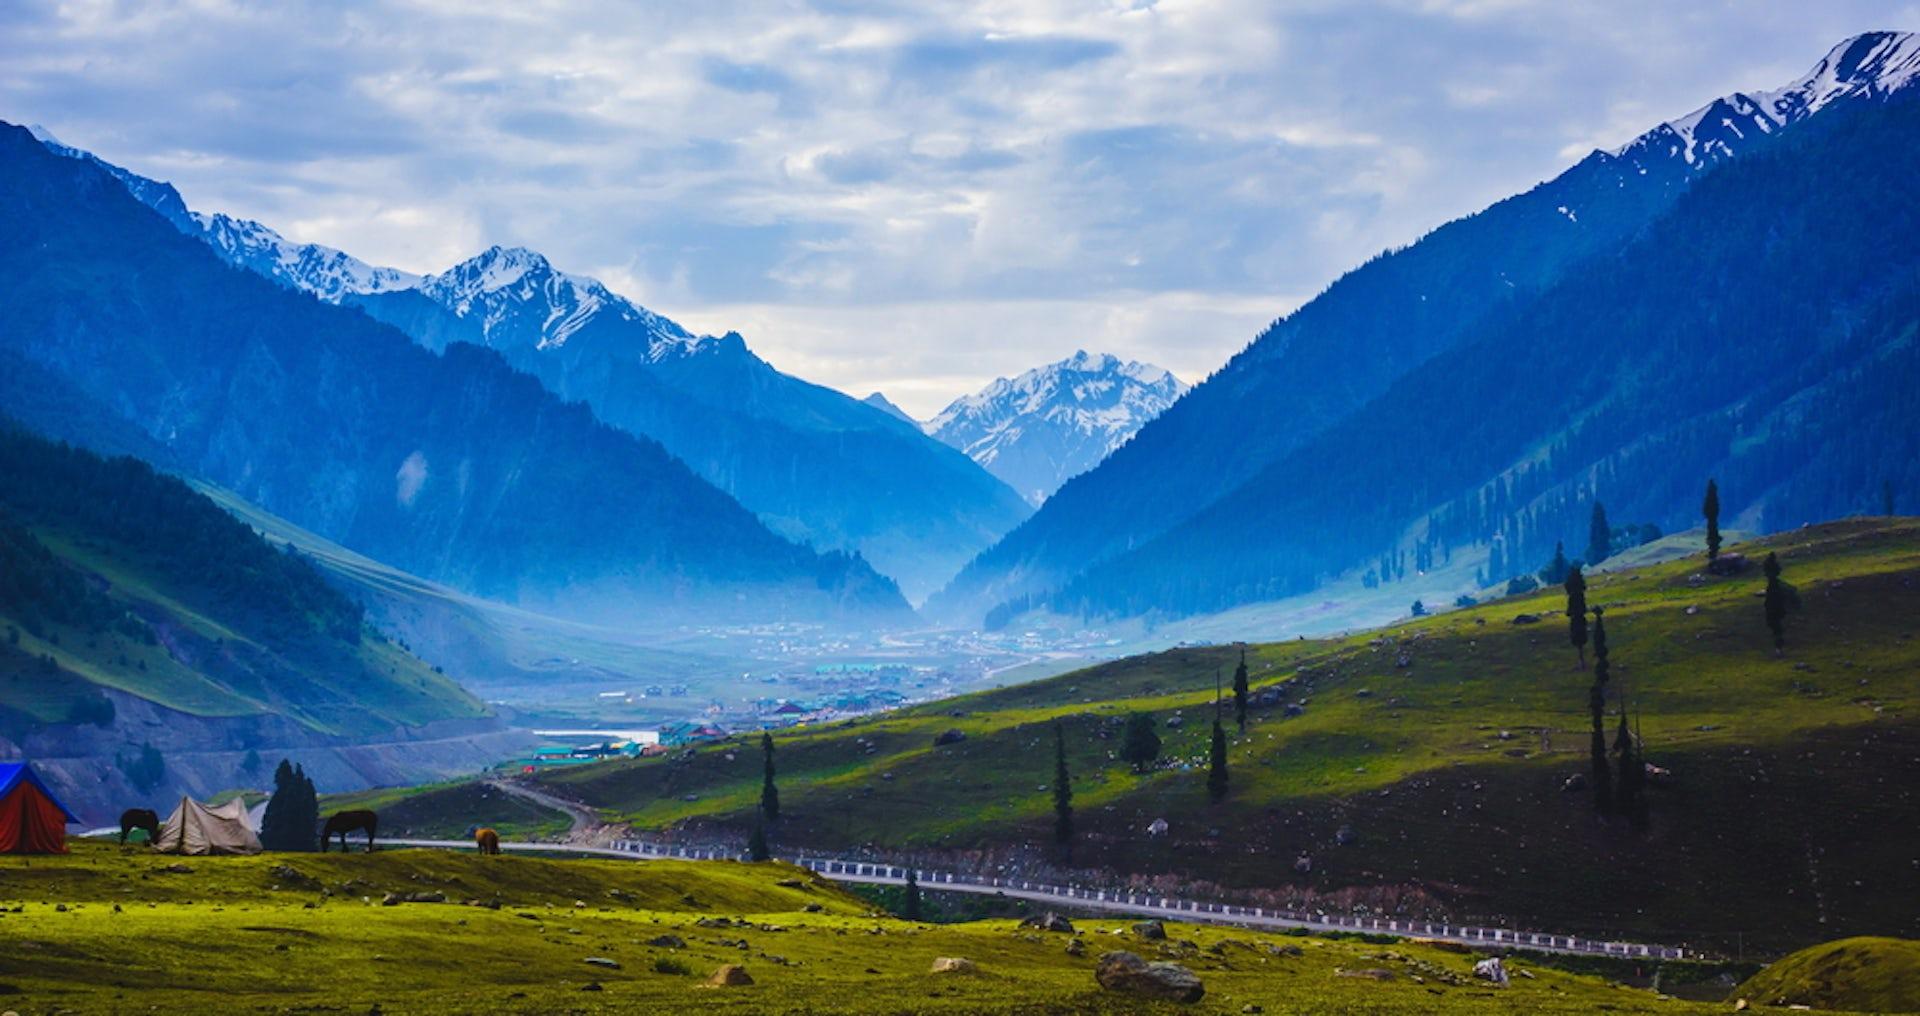 Kashmir: India Tomorrow part 3 podcast transcript